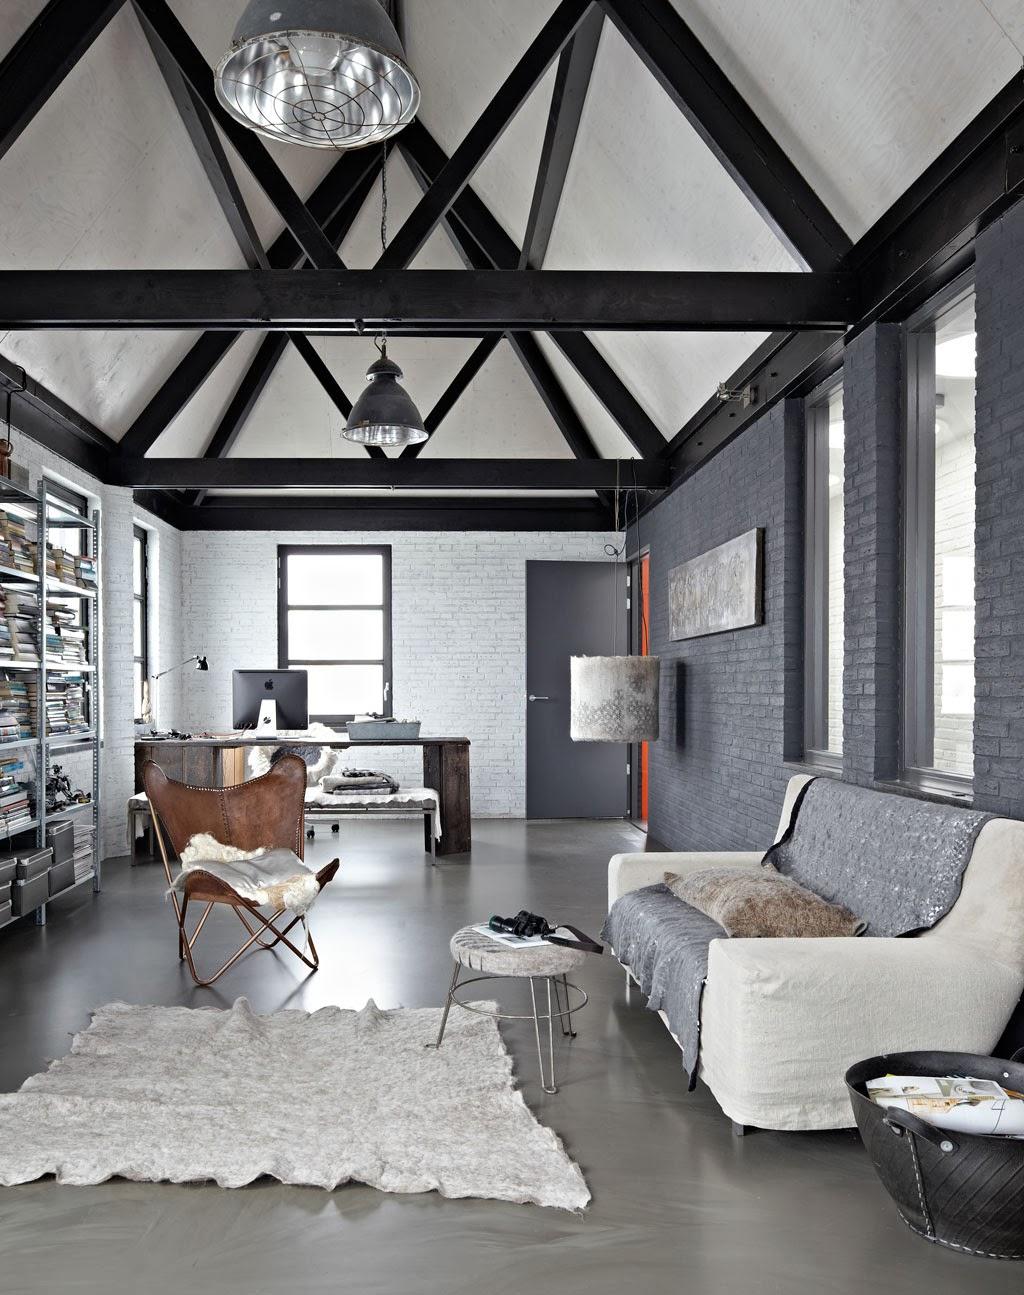 Stunning house in grey / Úžasný byt v šedom